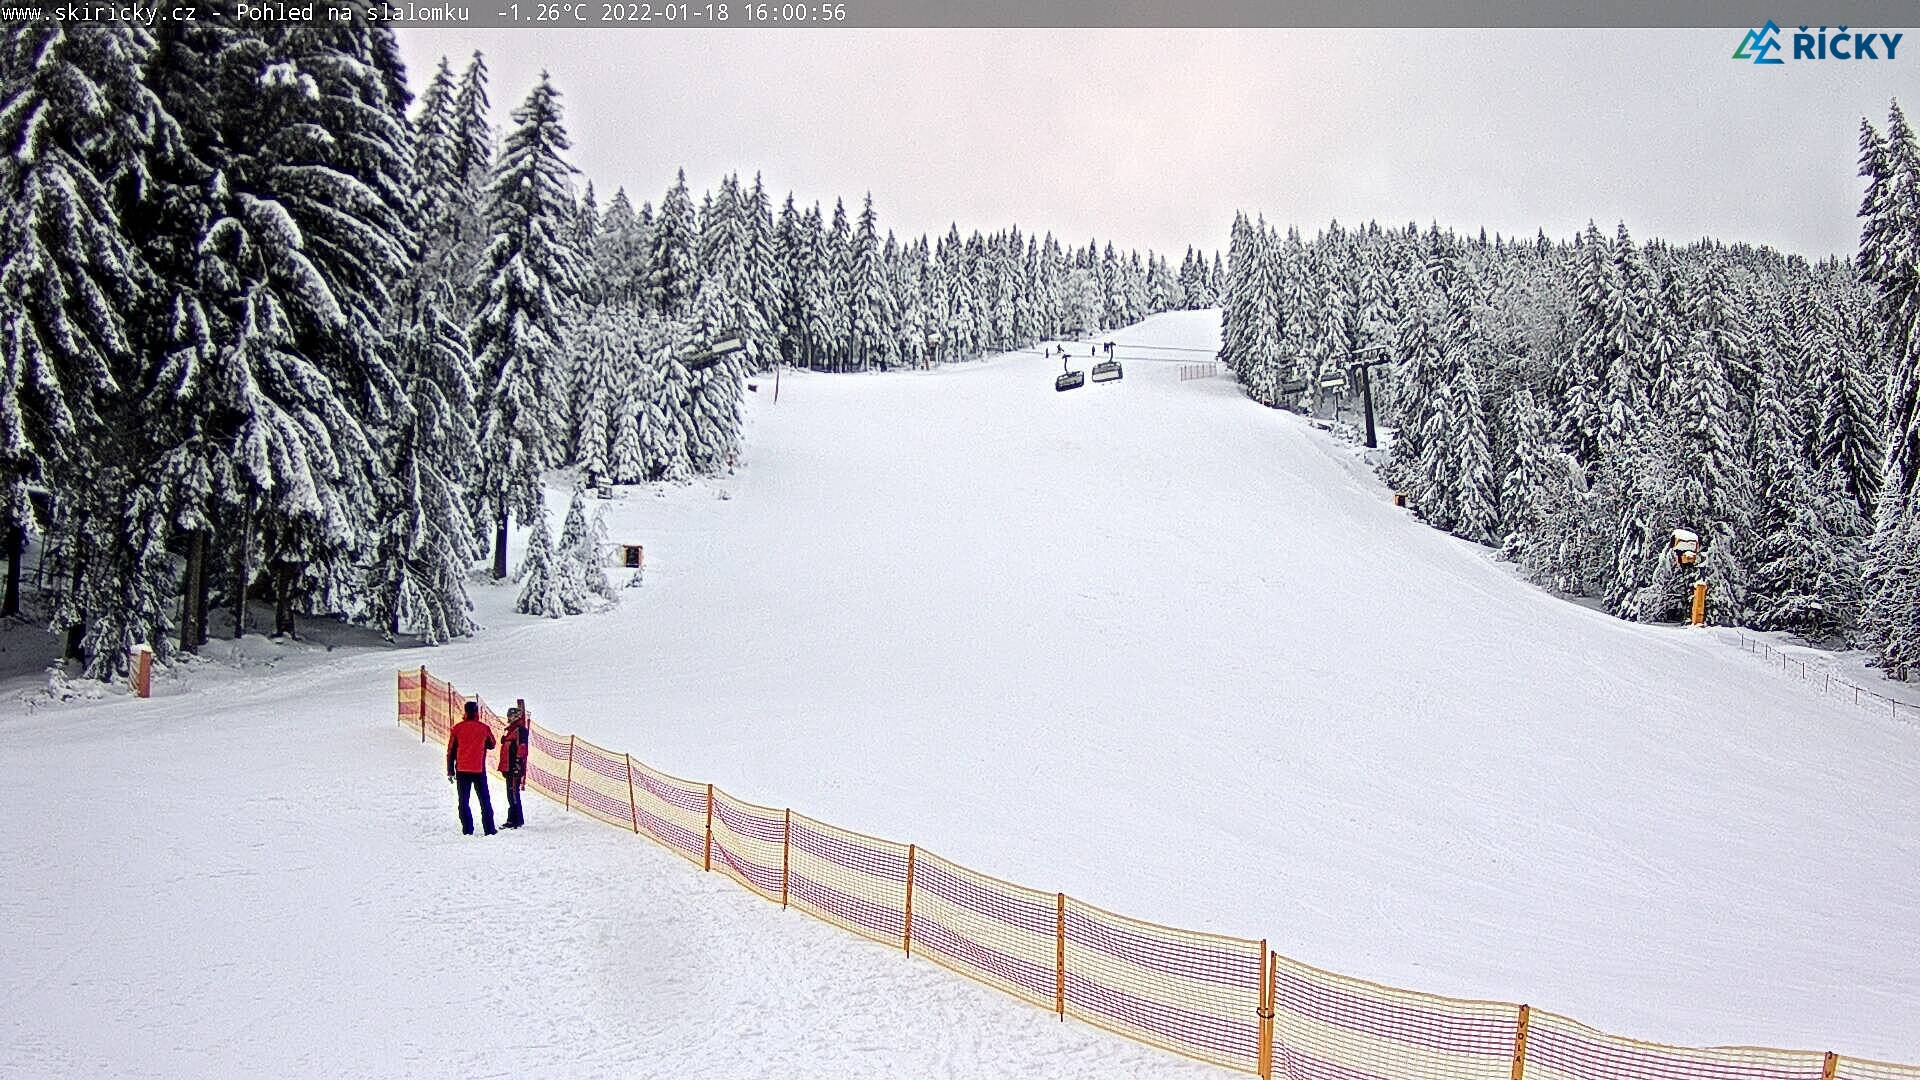 Webcam Ski Resort Ricky v O.h. schwarze Piste - Eagle Mountains